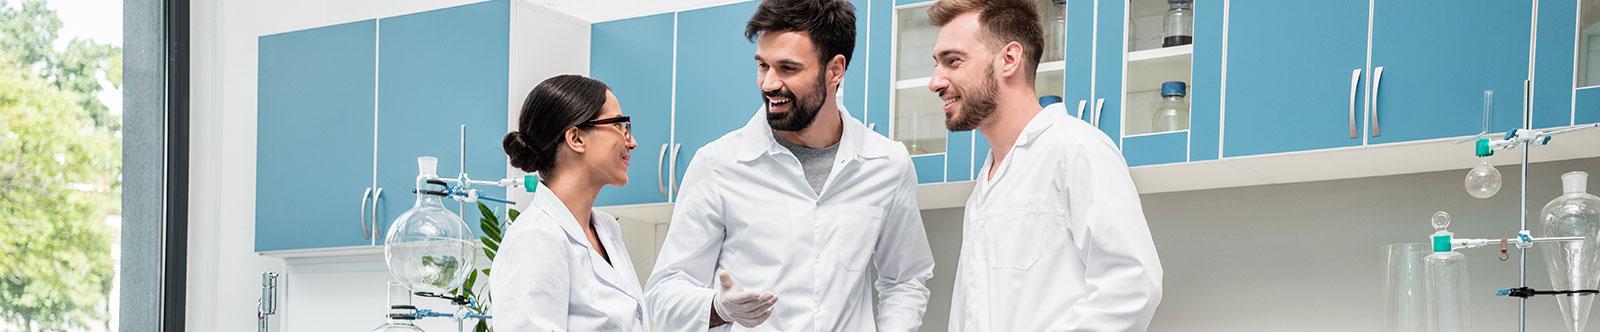 ATG Μικροβιολογικό εργαστήριο ευκαιρίες καριέρας